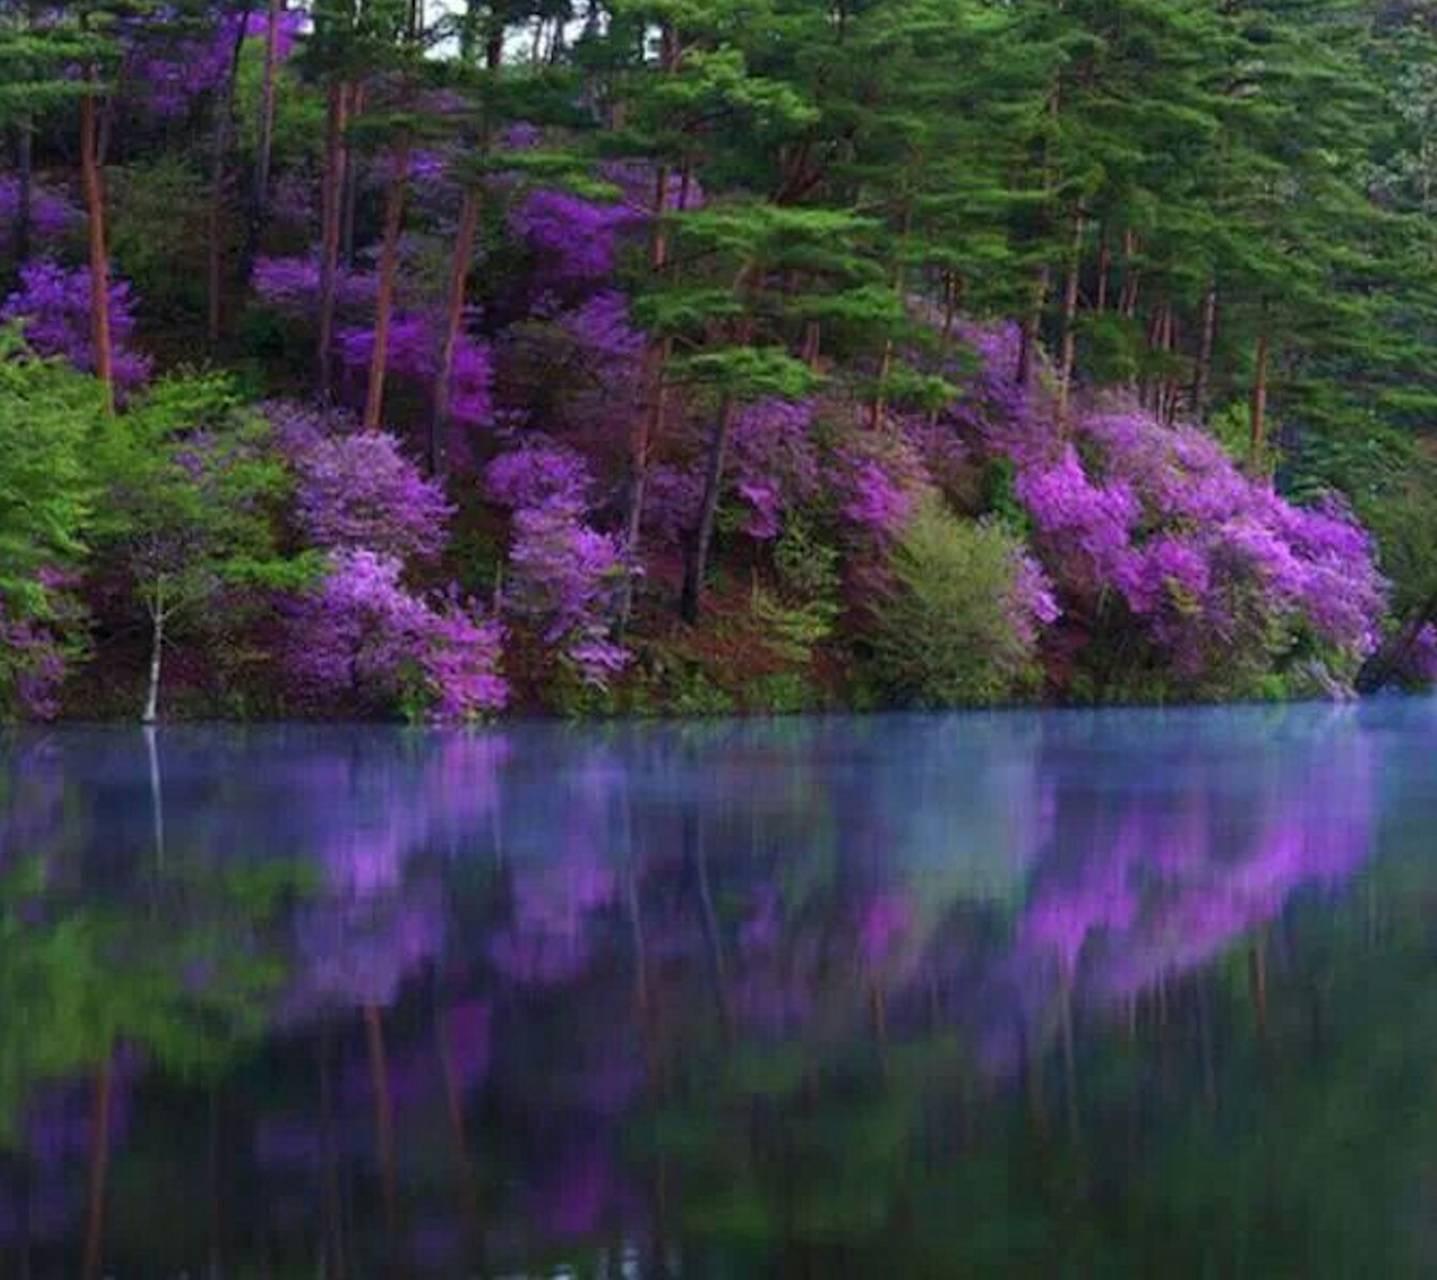 Purple Flowers Over